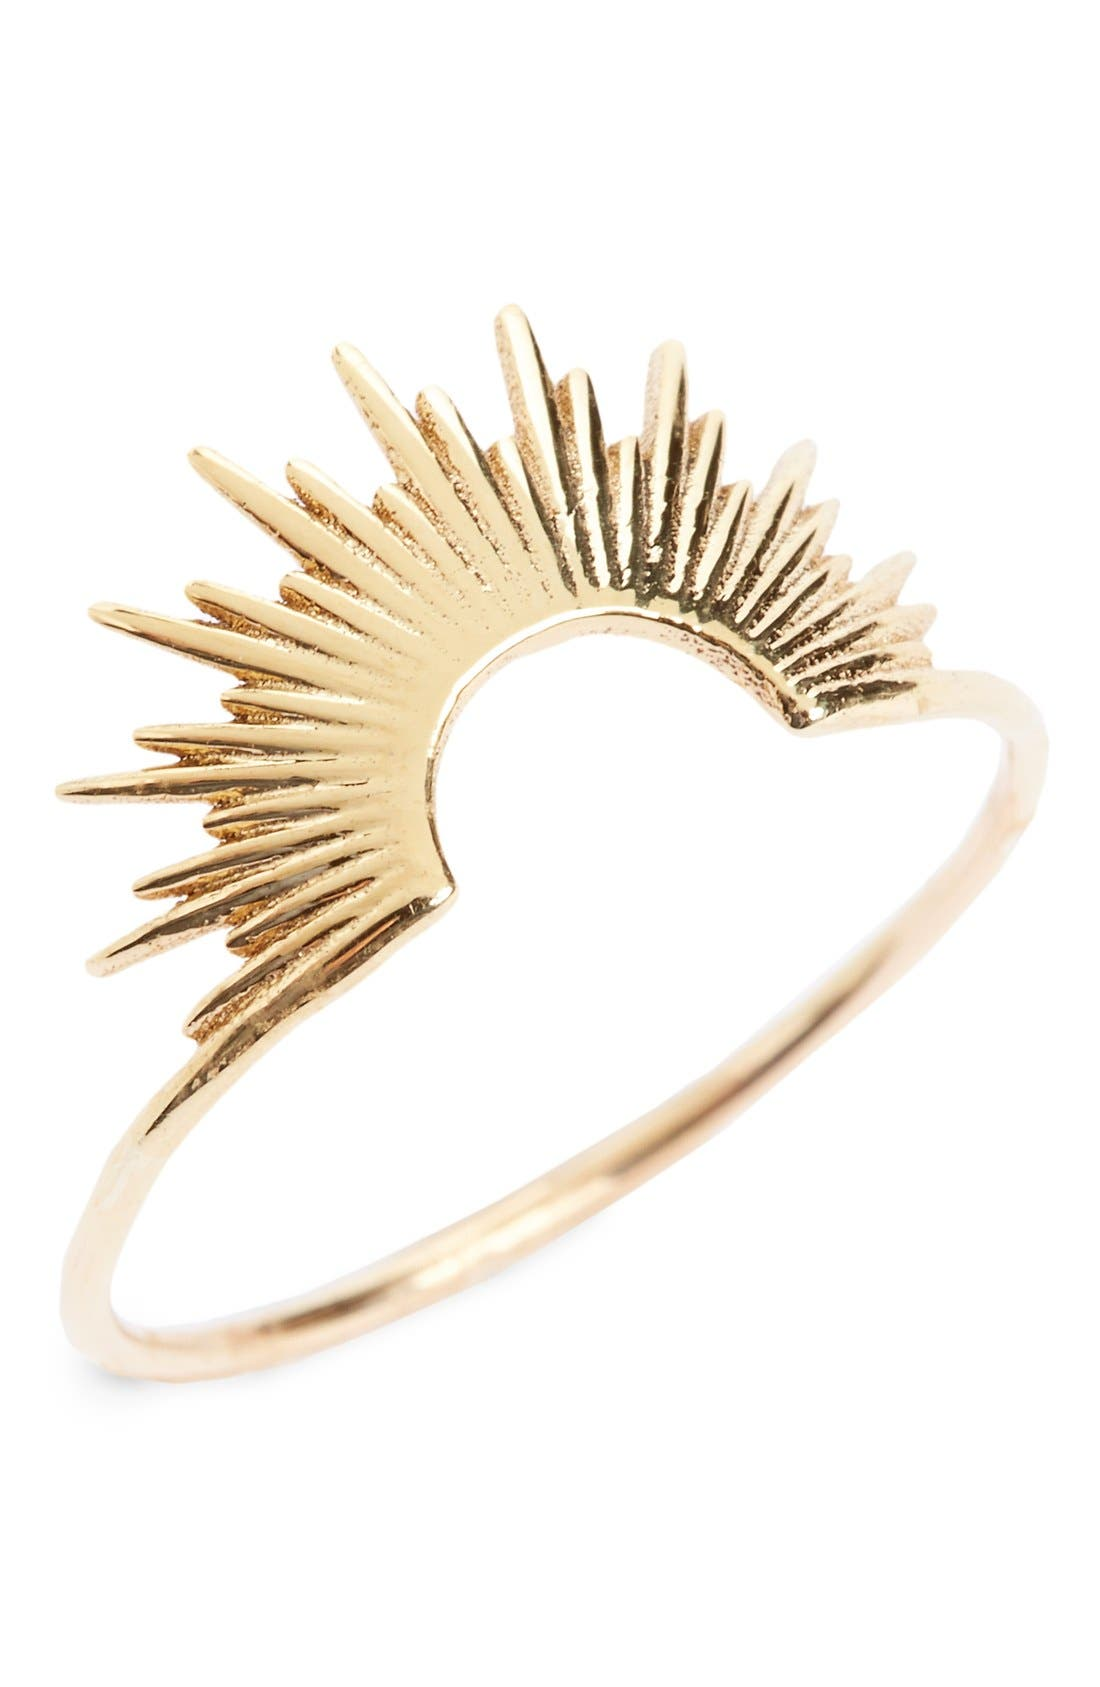 Alternate Image 1 Selected - SARAH & SEBASTIAN 'Nimbus' Ring